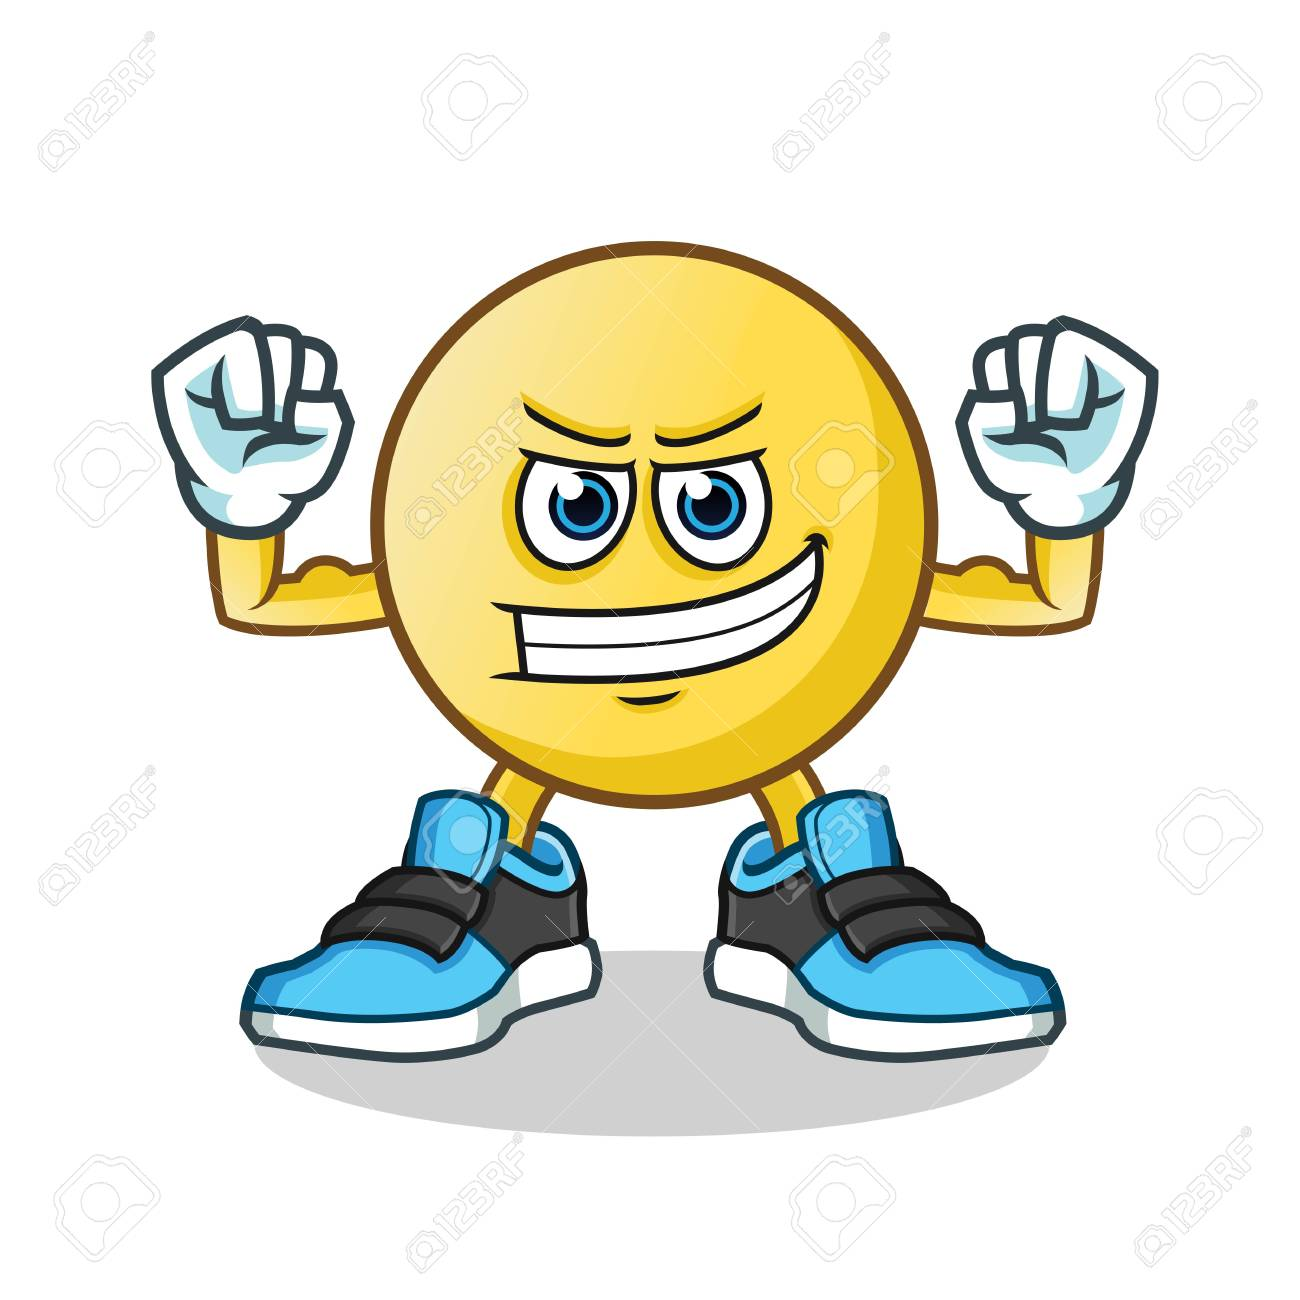 emoticon muscle mascot vector cartoon illustration royalty free